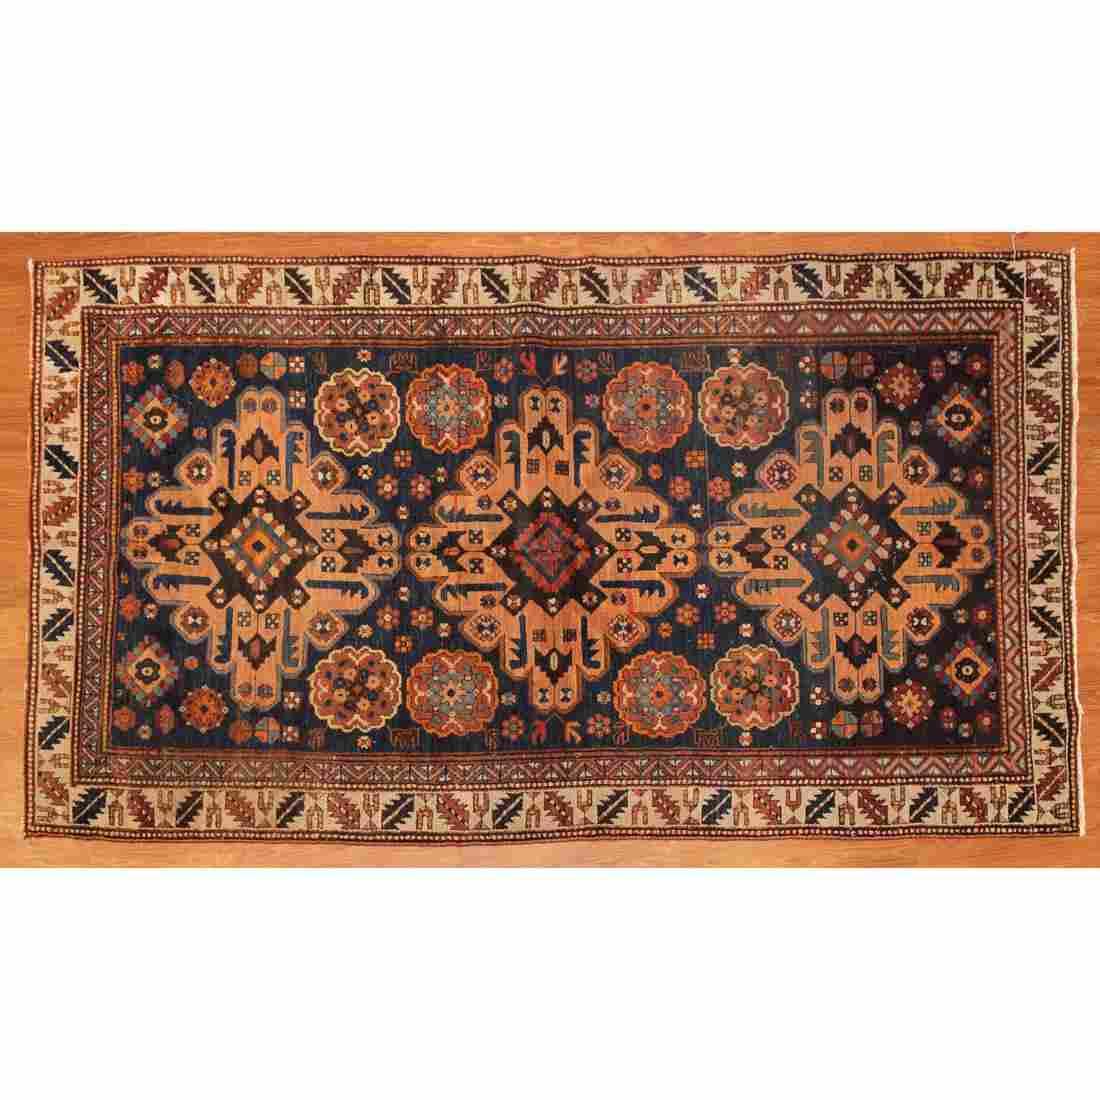 Antique Malayer Rug, Persia, 3.10 x 6.10